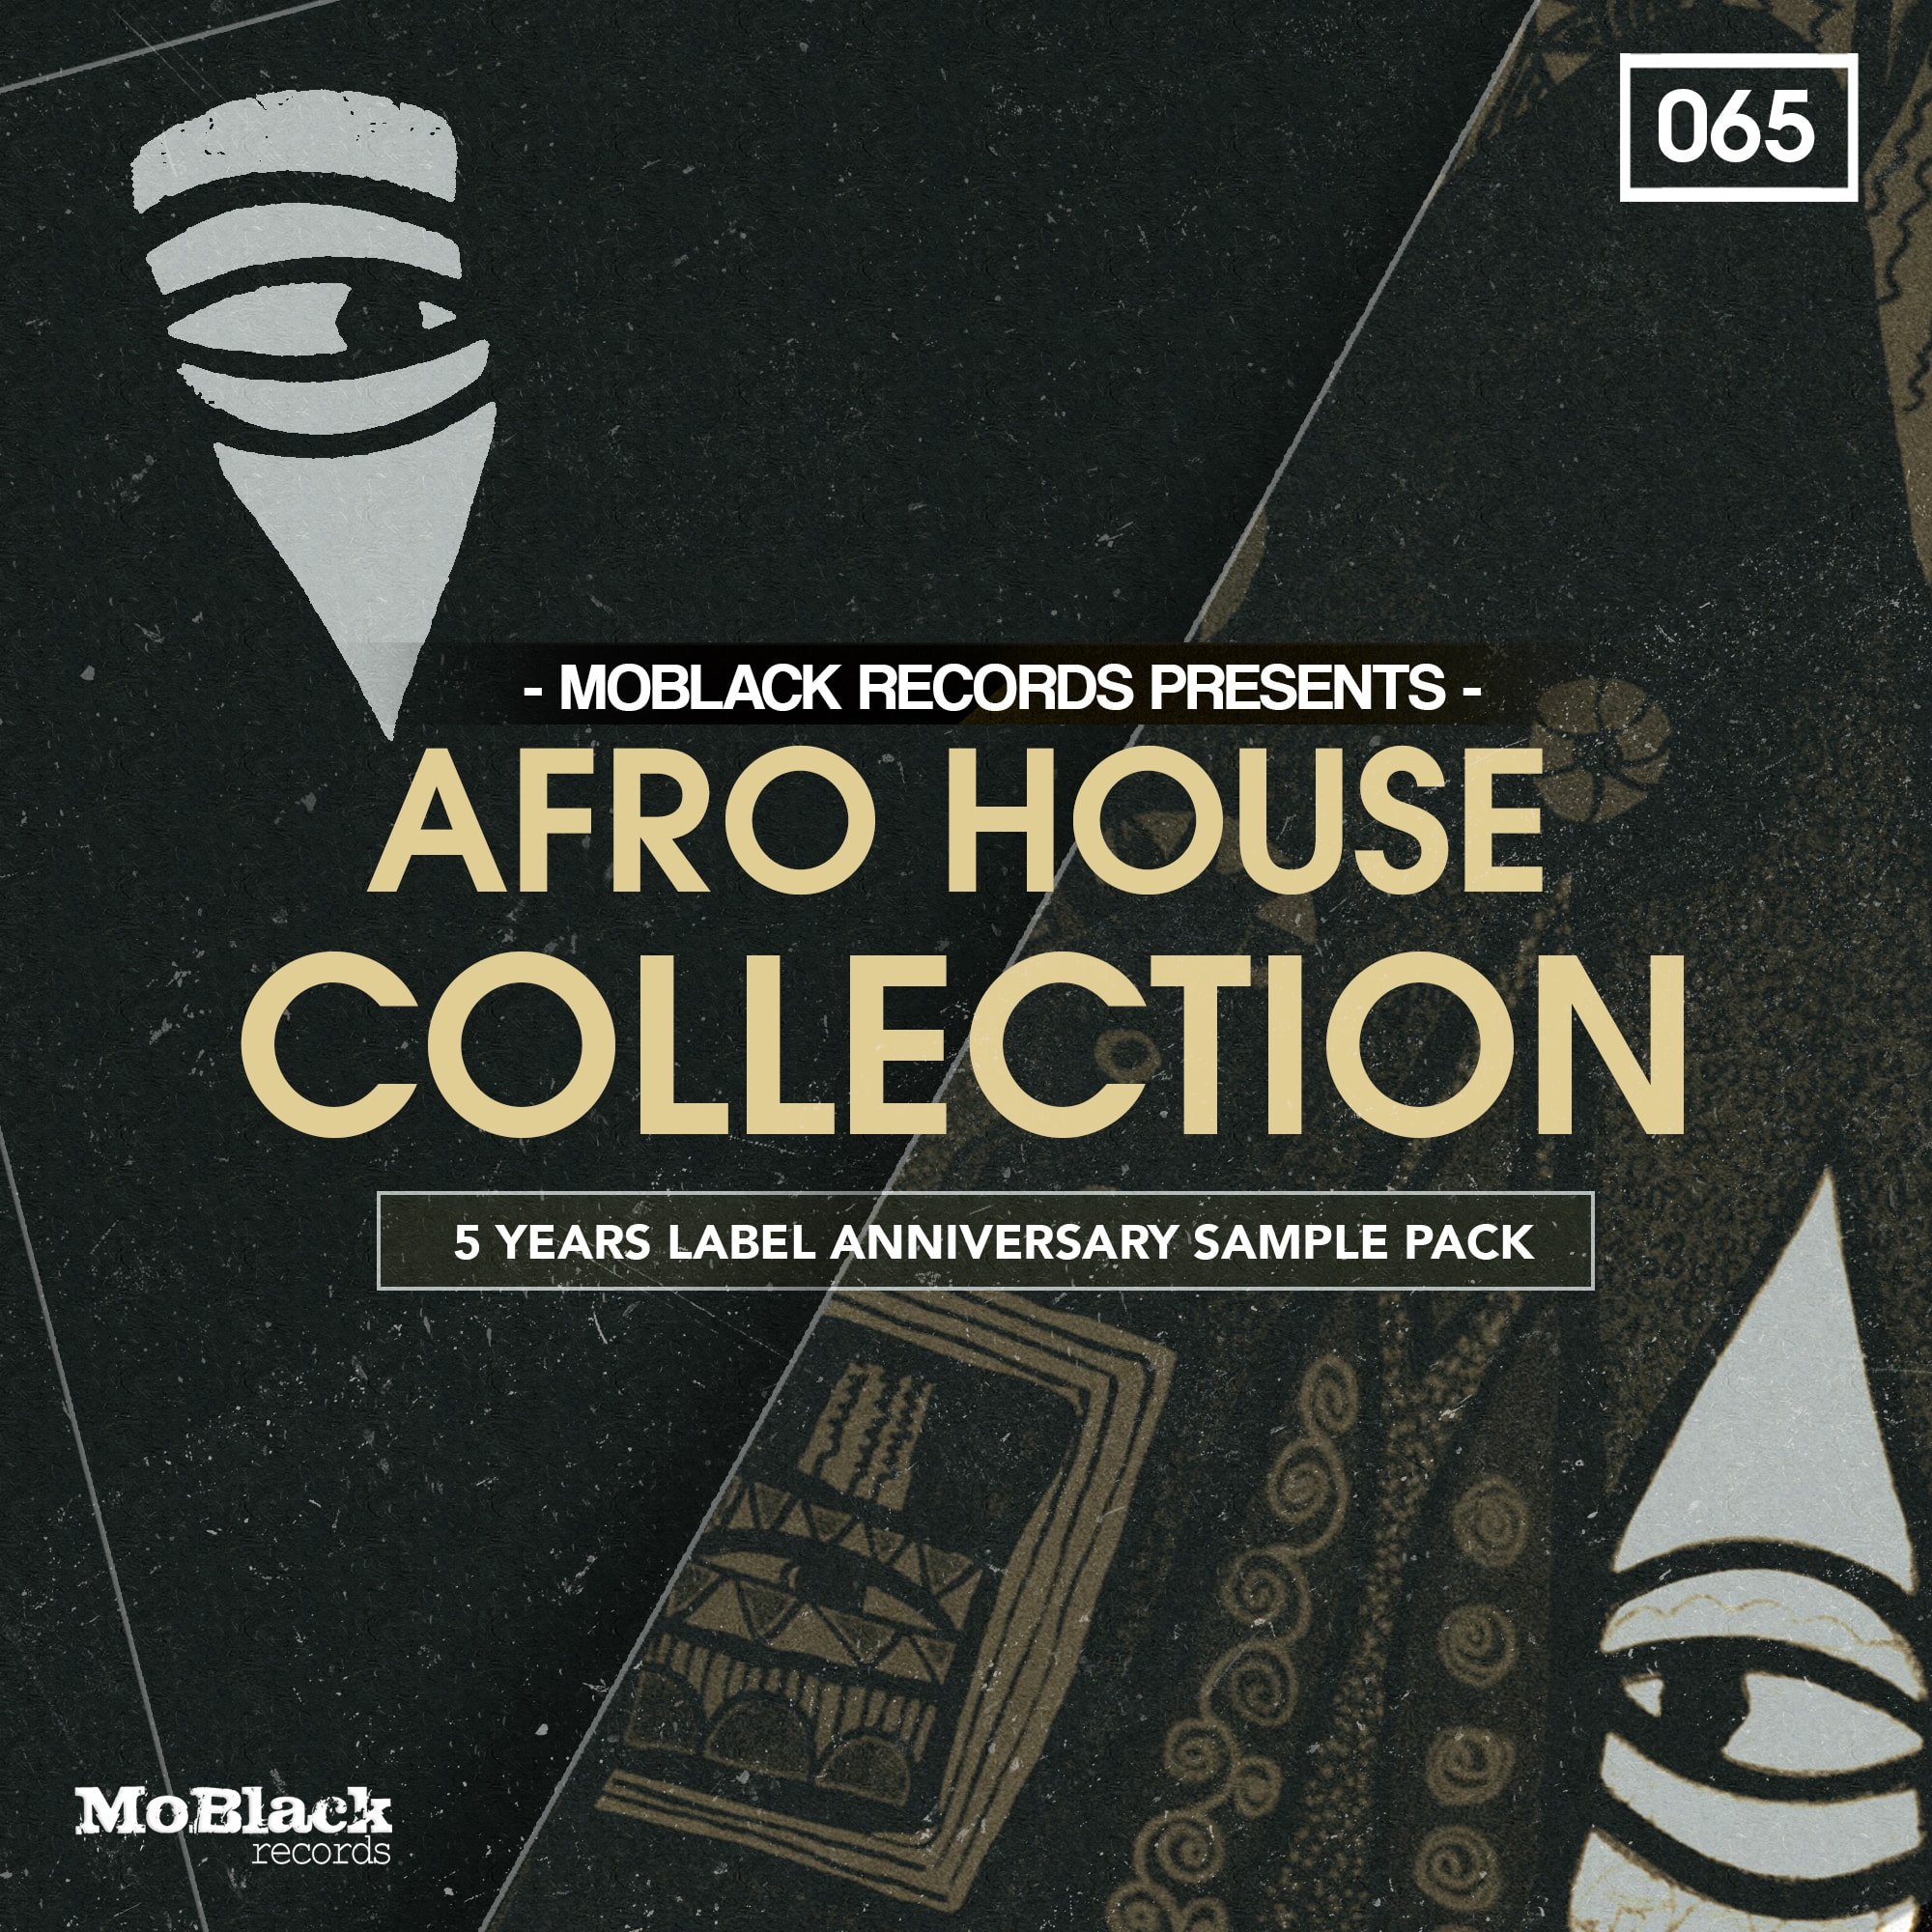 Bingoshakerz MoBlack Records Presents Afro House Collection